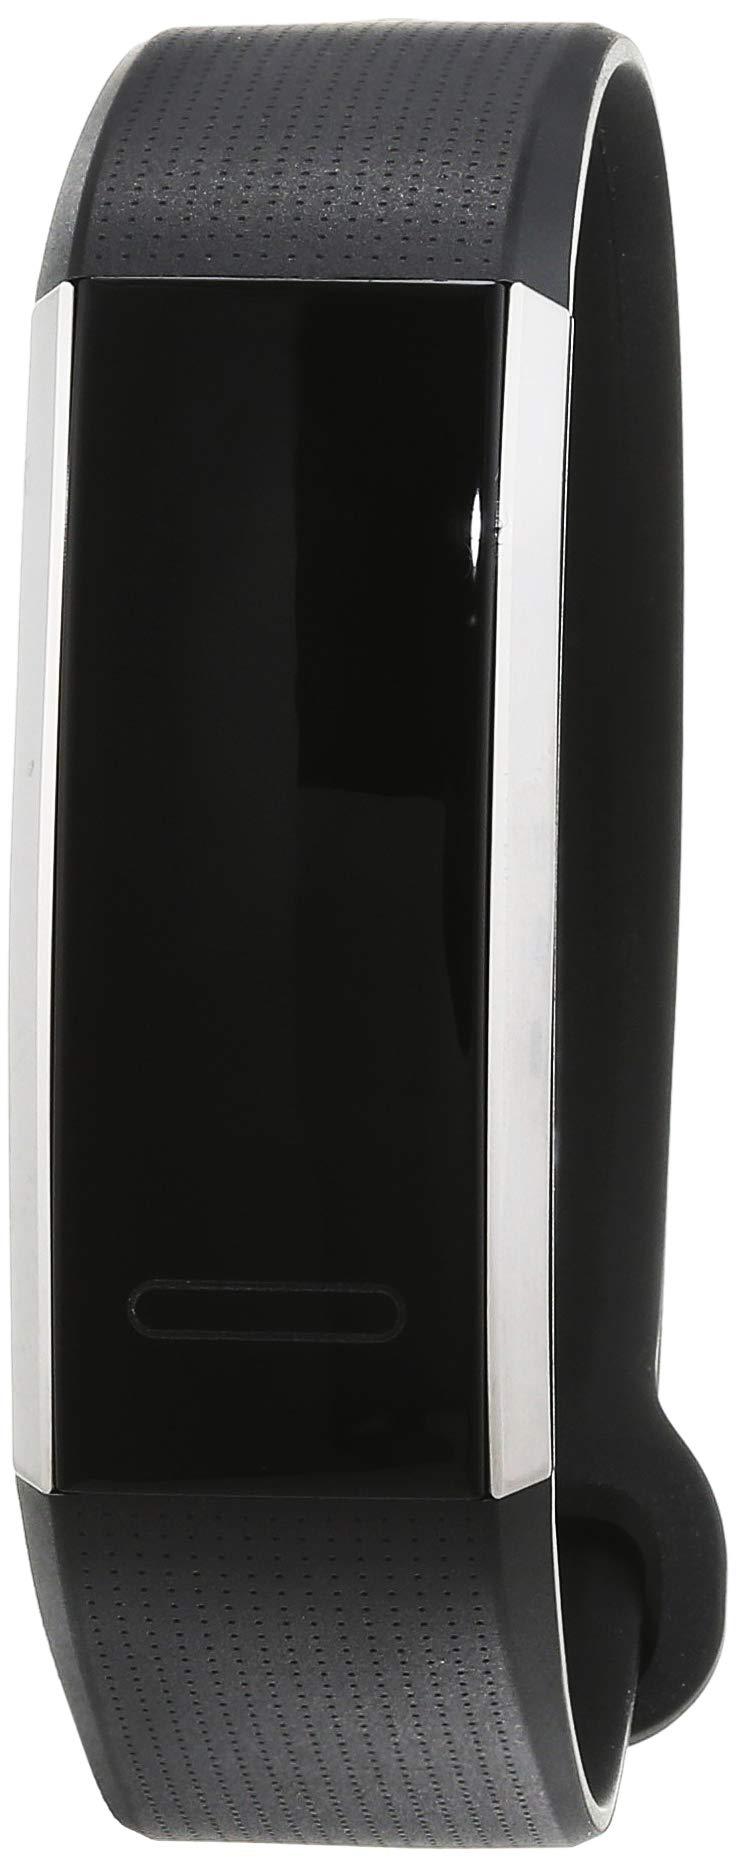 Huawei-55022283-Talkband-B2-Pro-Smartwatch-schwarz